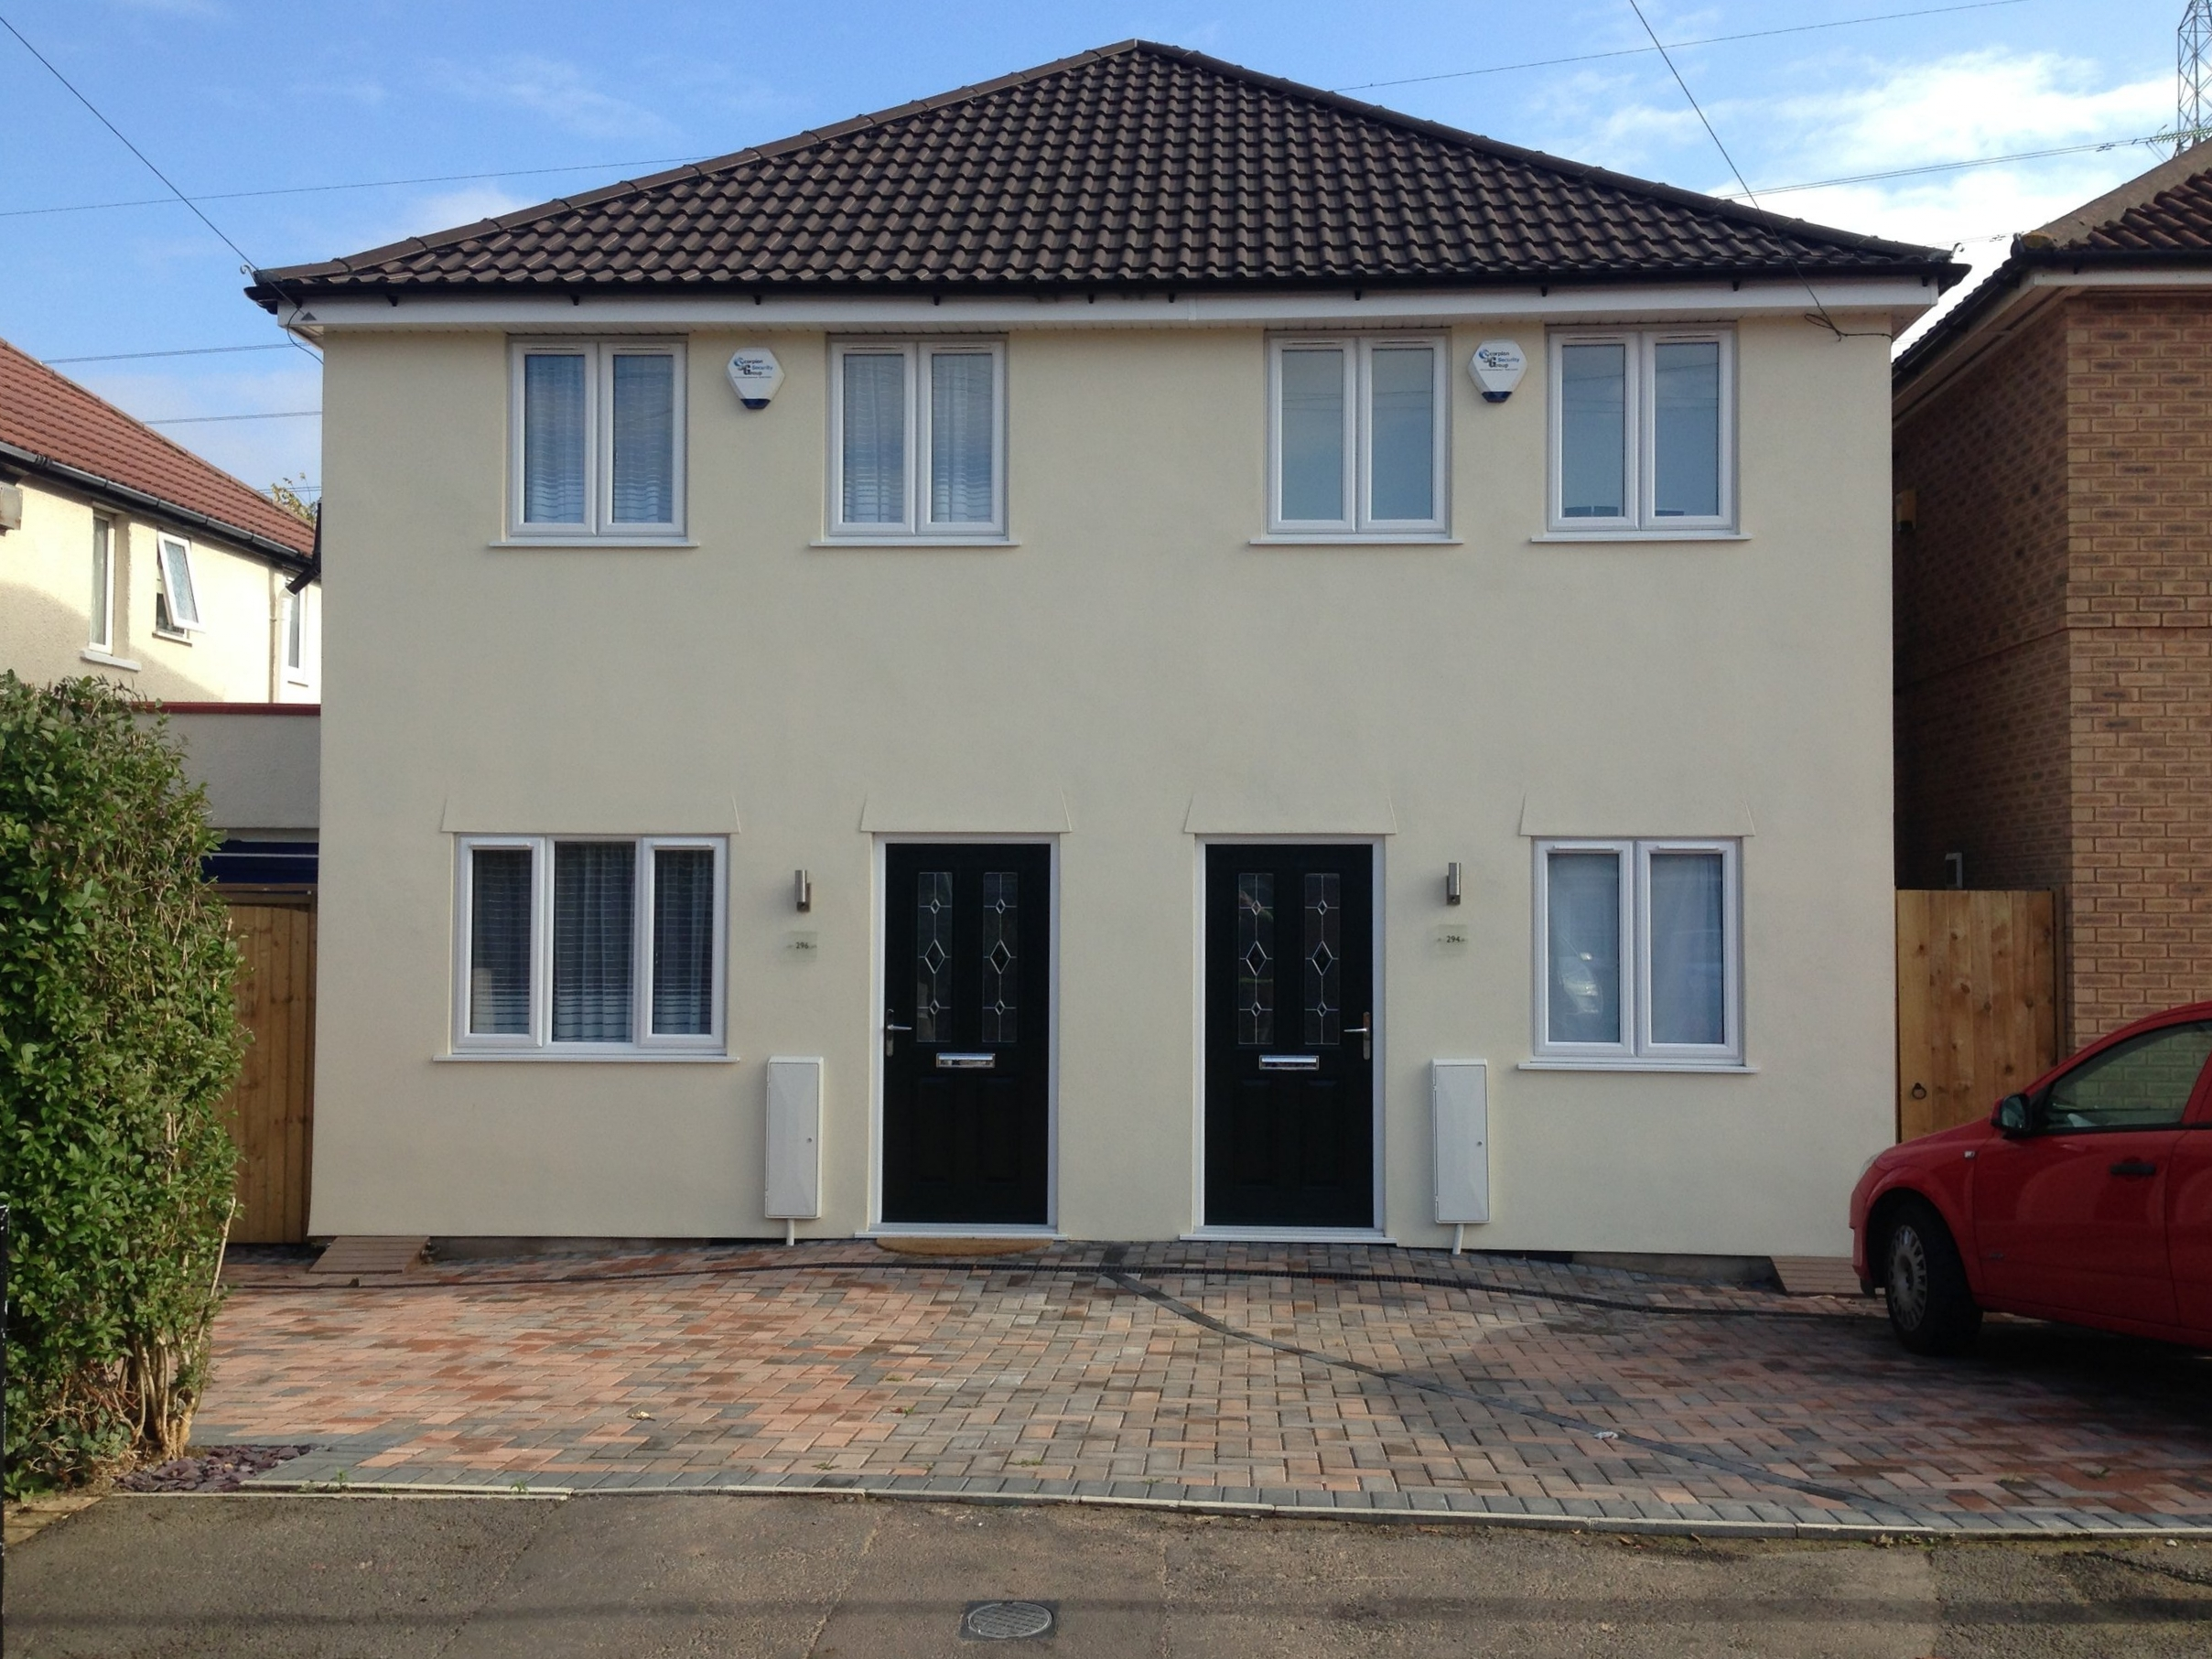 2 New-build homes - Bristol, Wordsworth Road